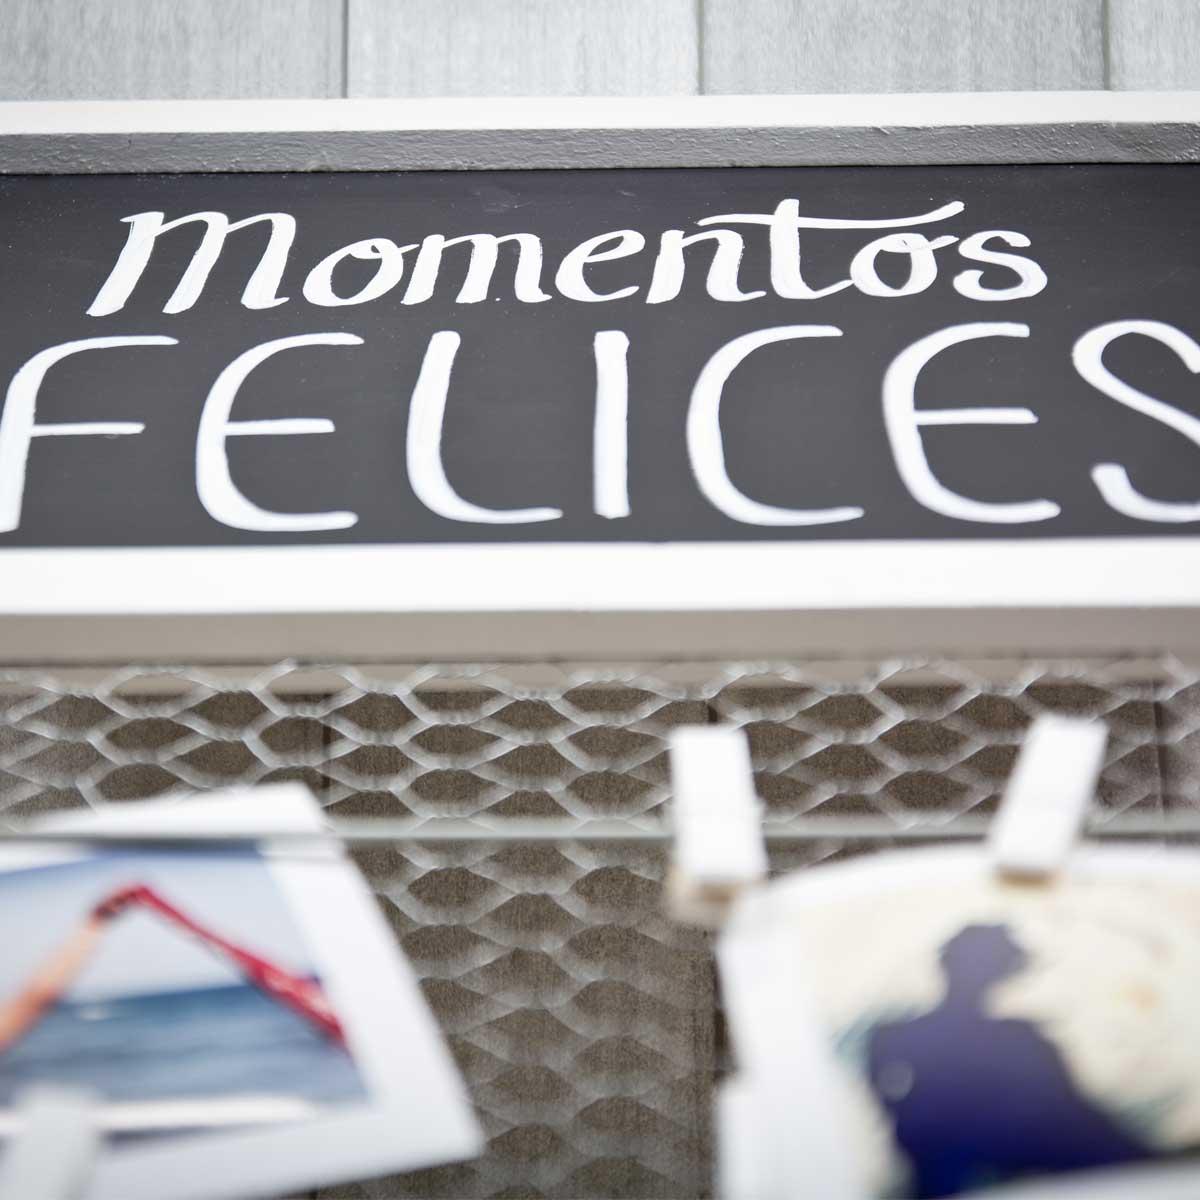 MRWONDERFUL_07012013_PIZARRA-MOMENTOS-FELICES_03